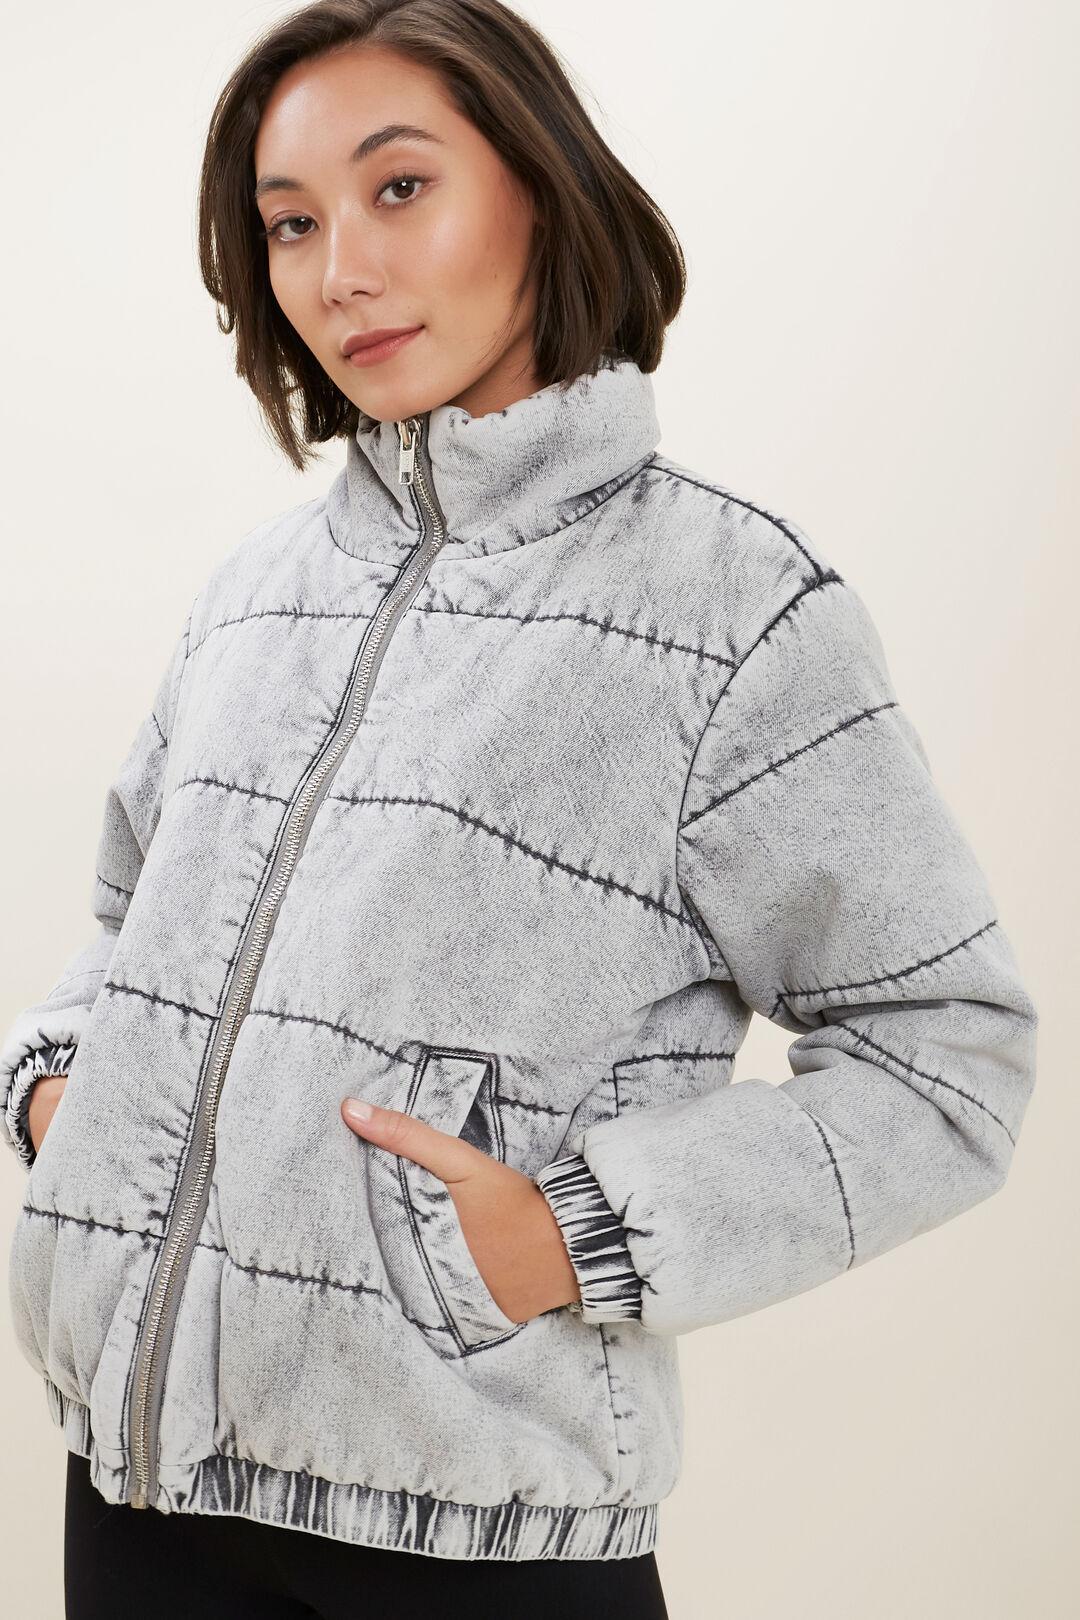 Acid Wash Denim Jacket  STONE GREY  hi-res